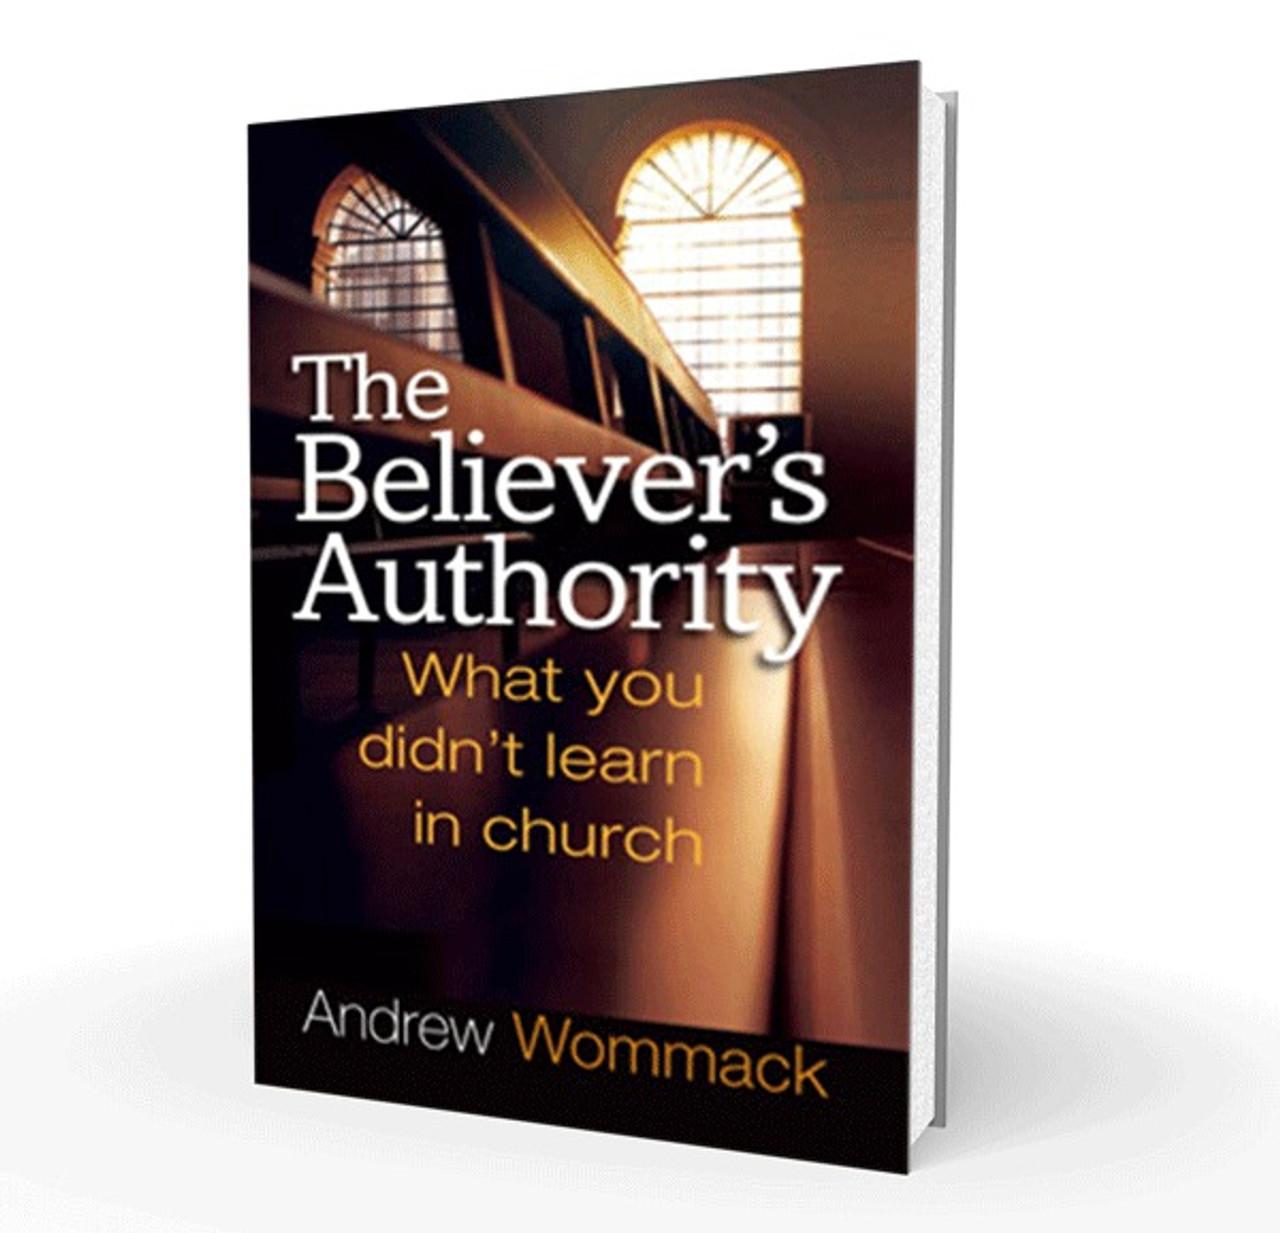 Book - The Believer's Authority